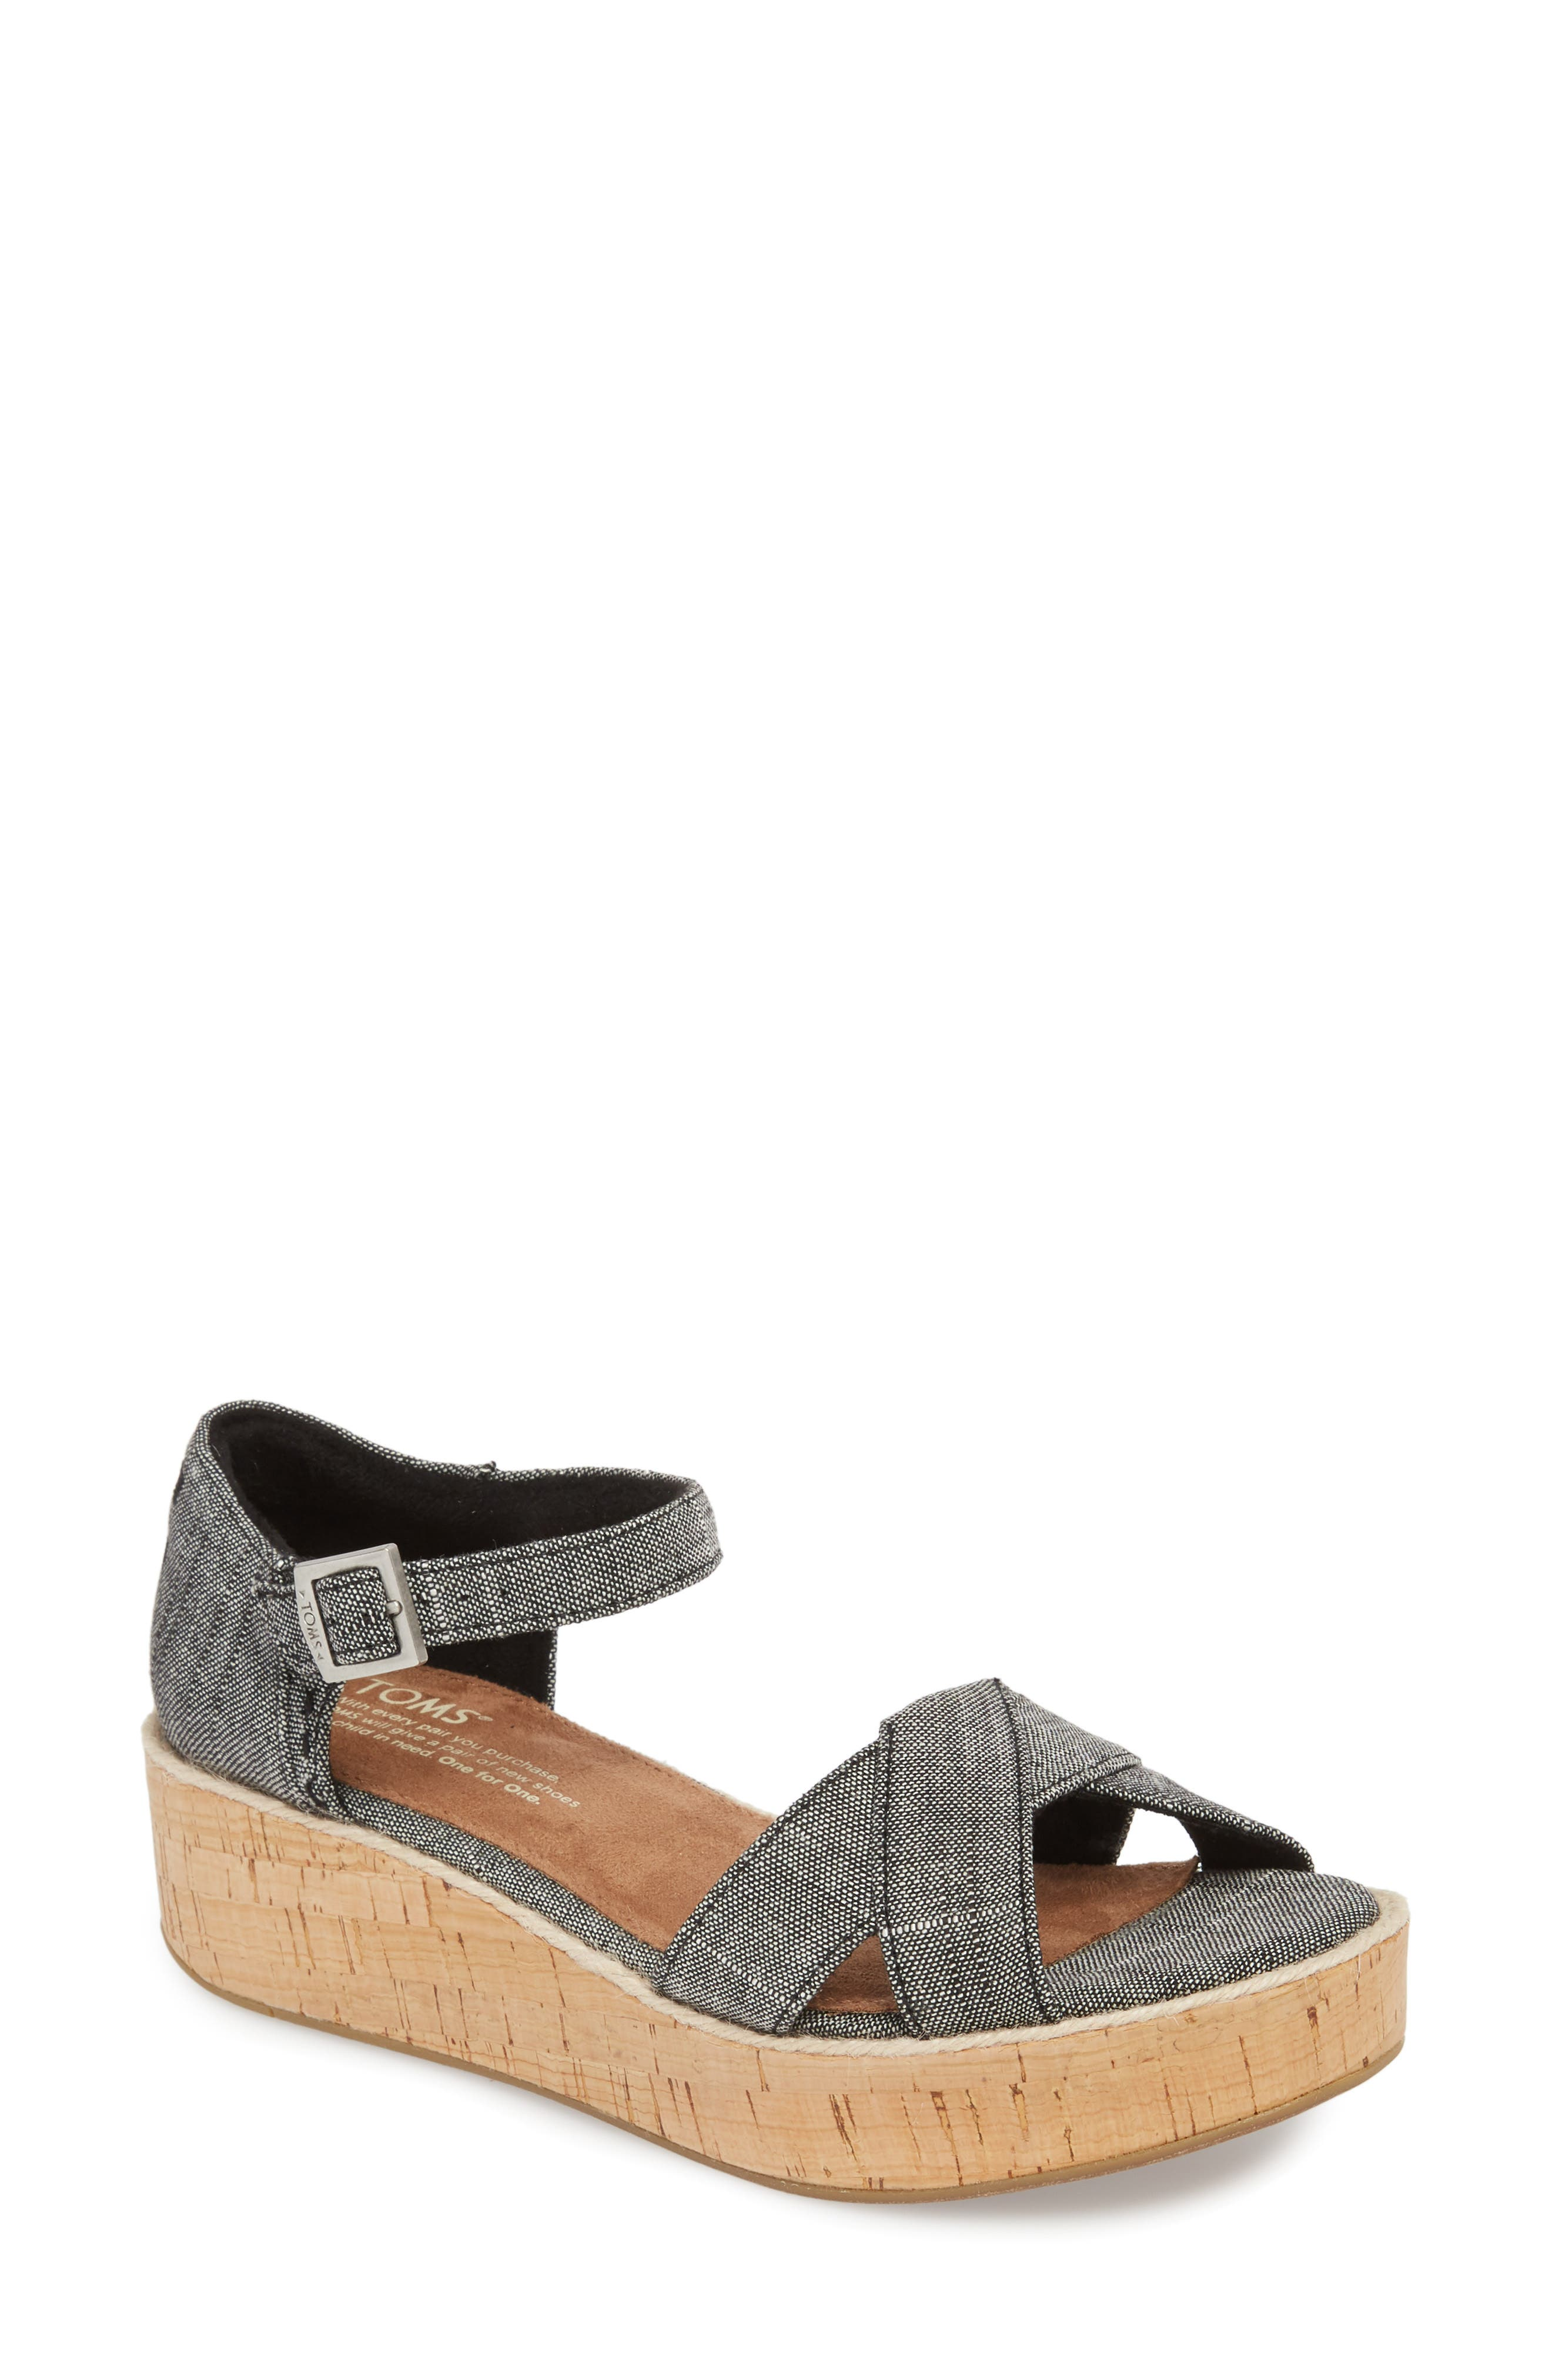 Harper Platform Sandal,                             Main thumbnail 1, color,